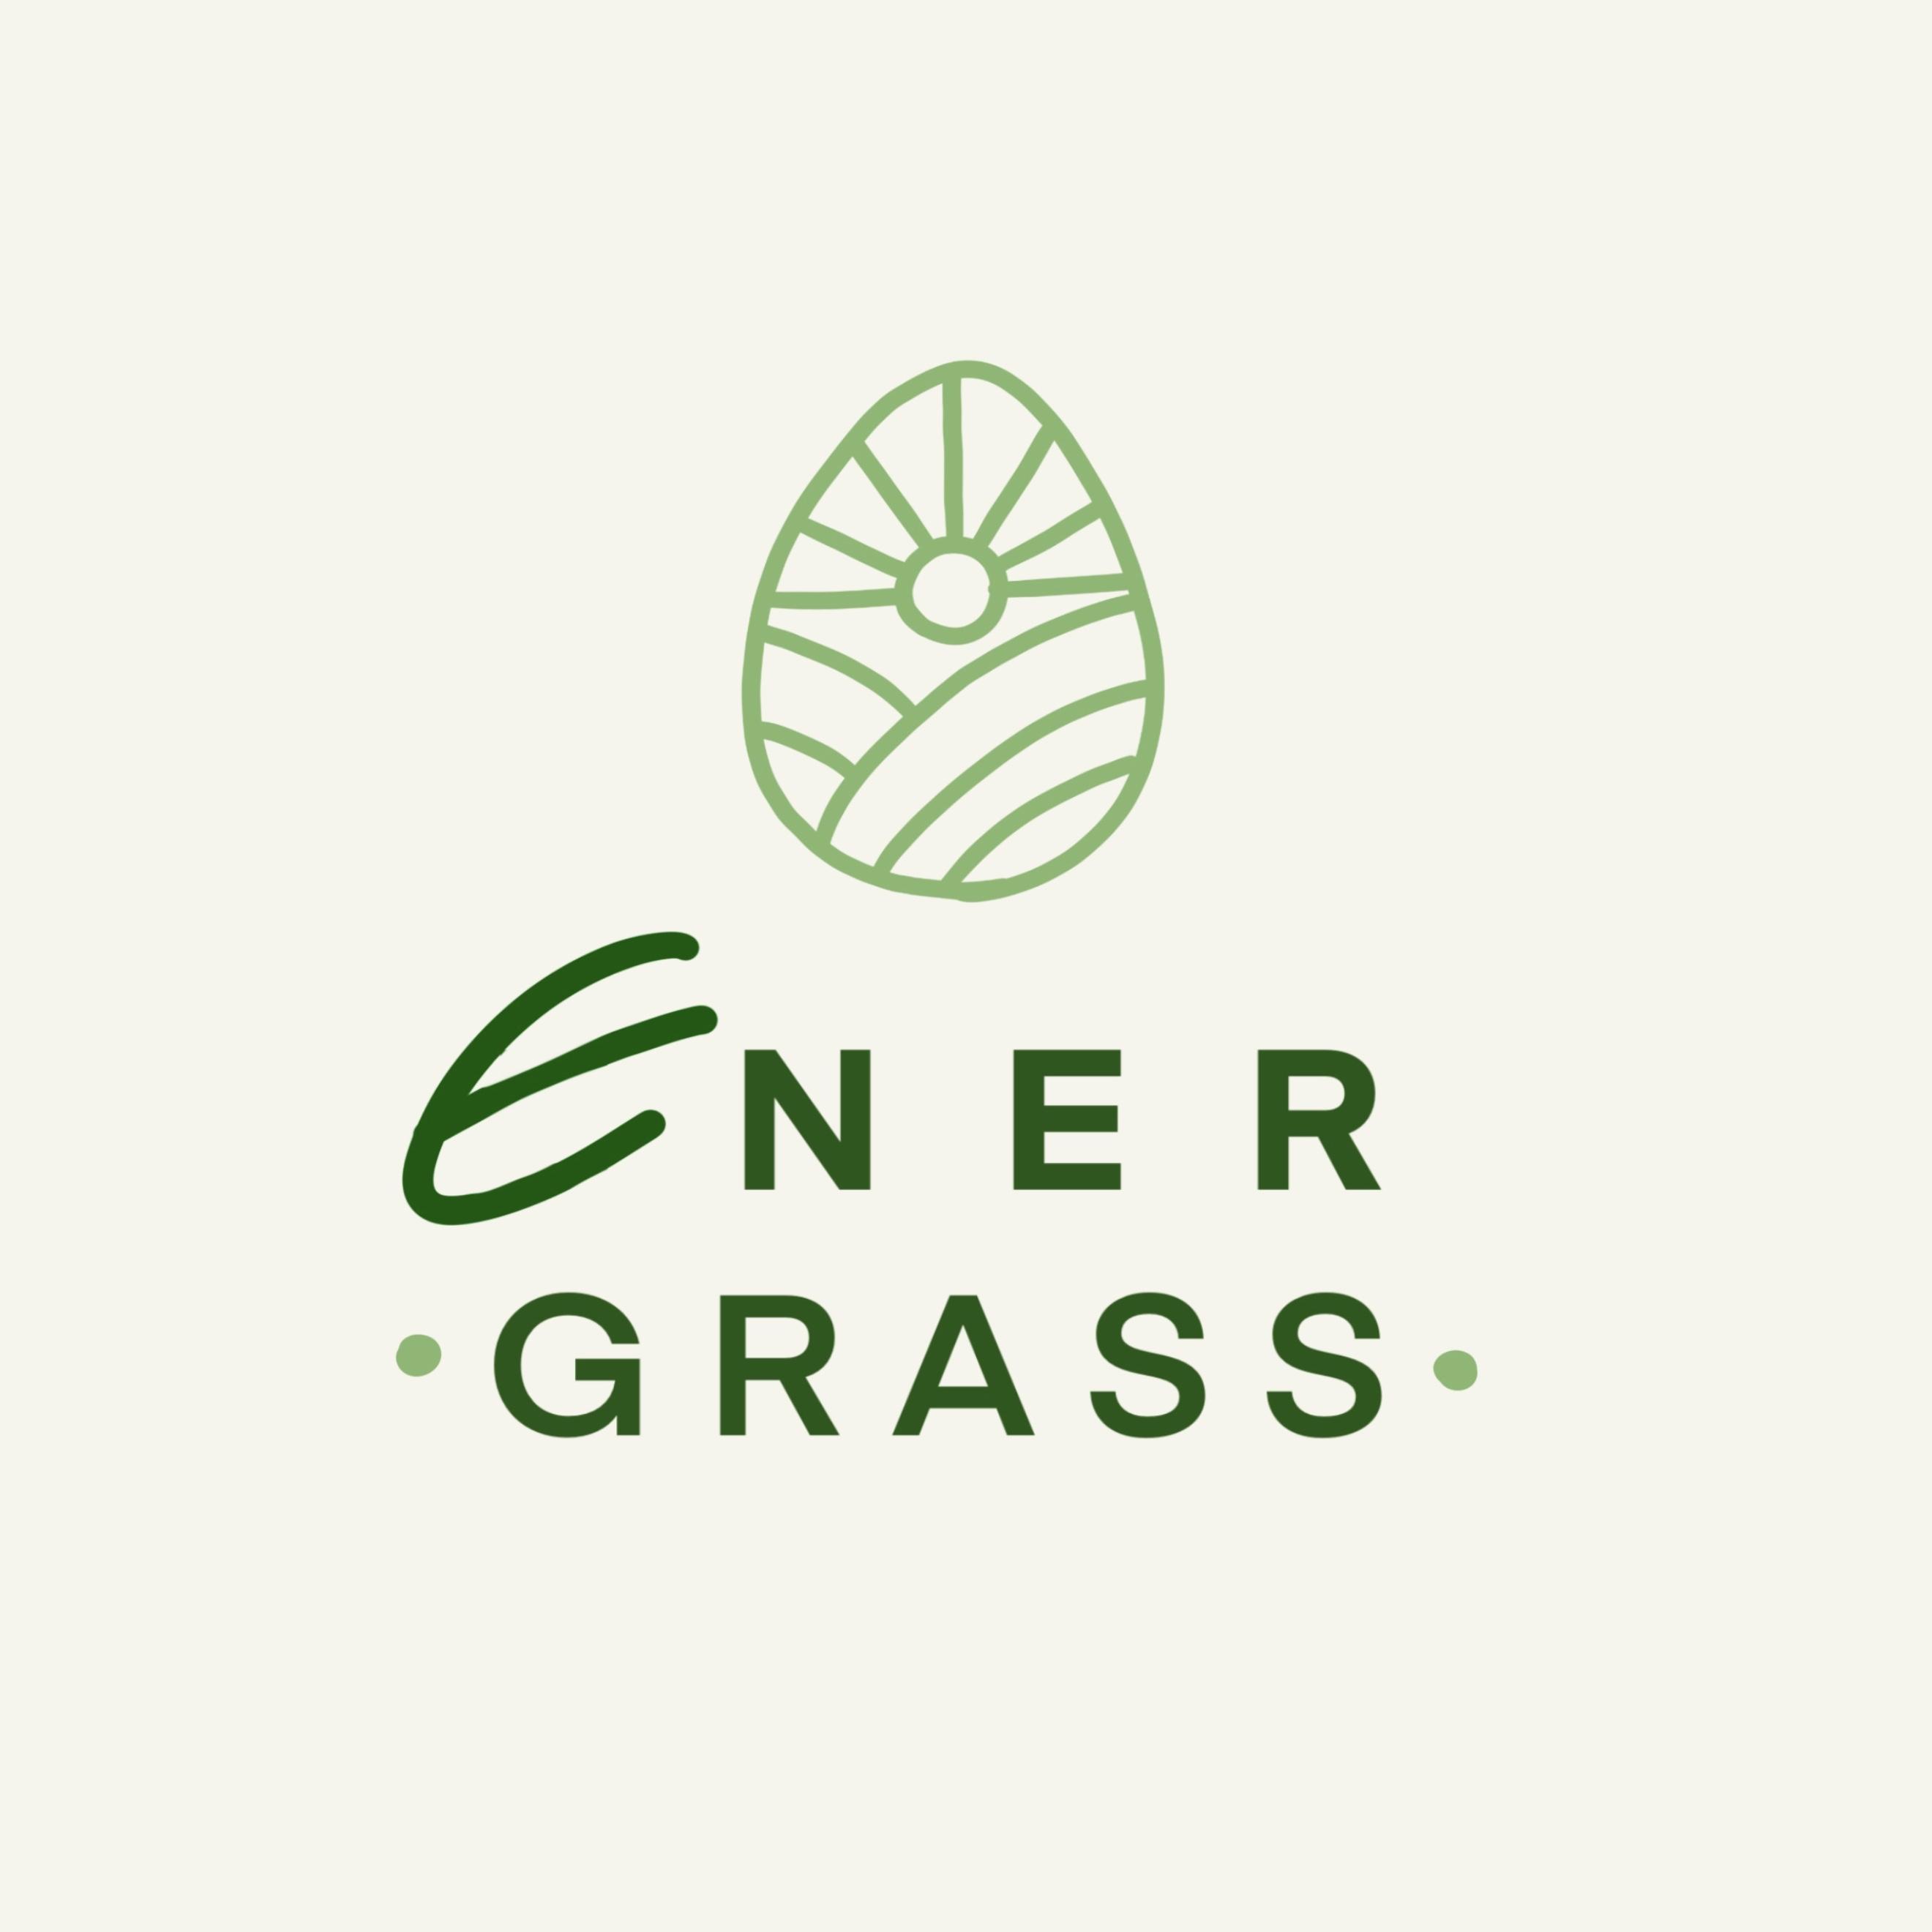 Графический дизайнер для создания логотипа Energrass. фото f_1645f8d9fd1b395e.jpg